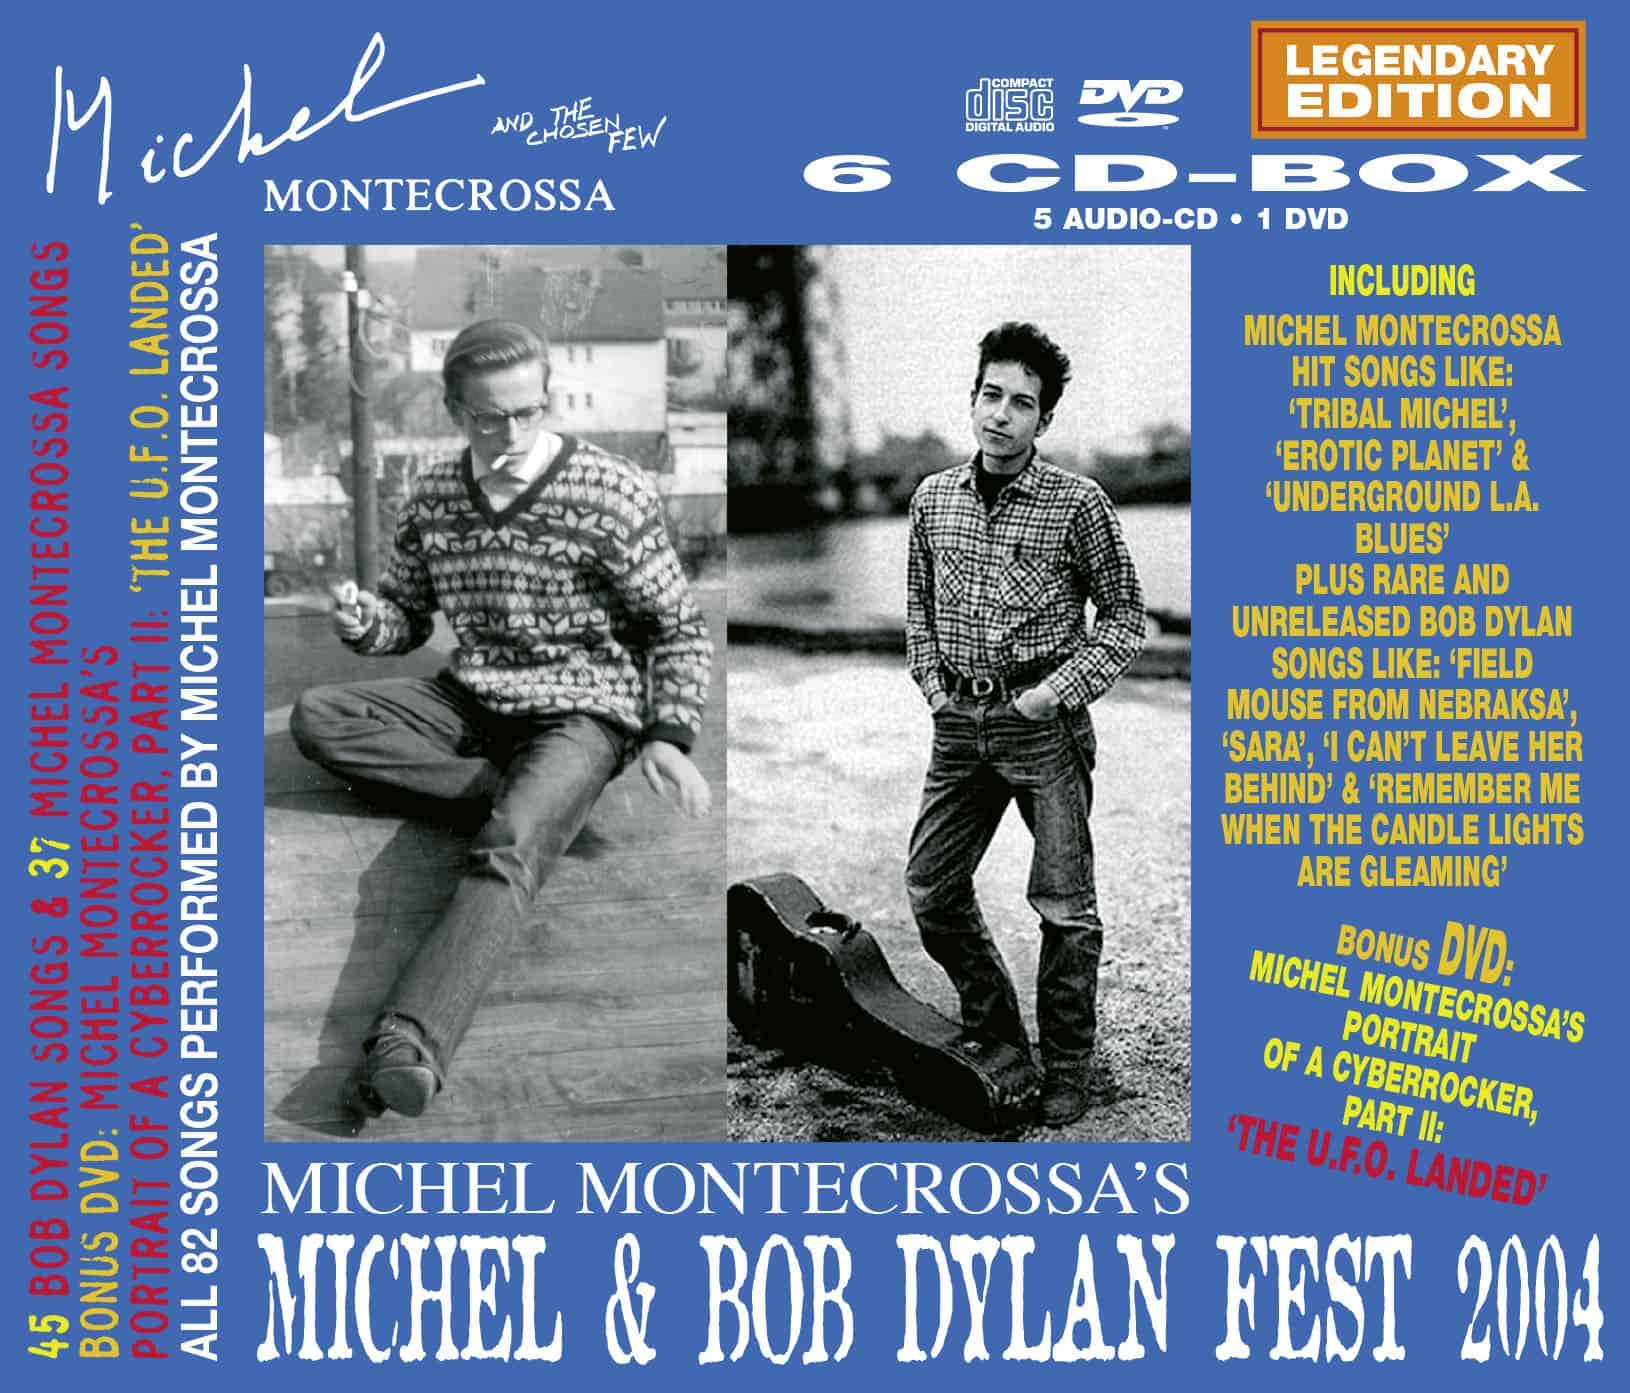 Michel Montecrossa' Michel & Bob Dylan Fest 2004